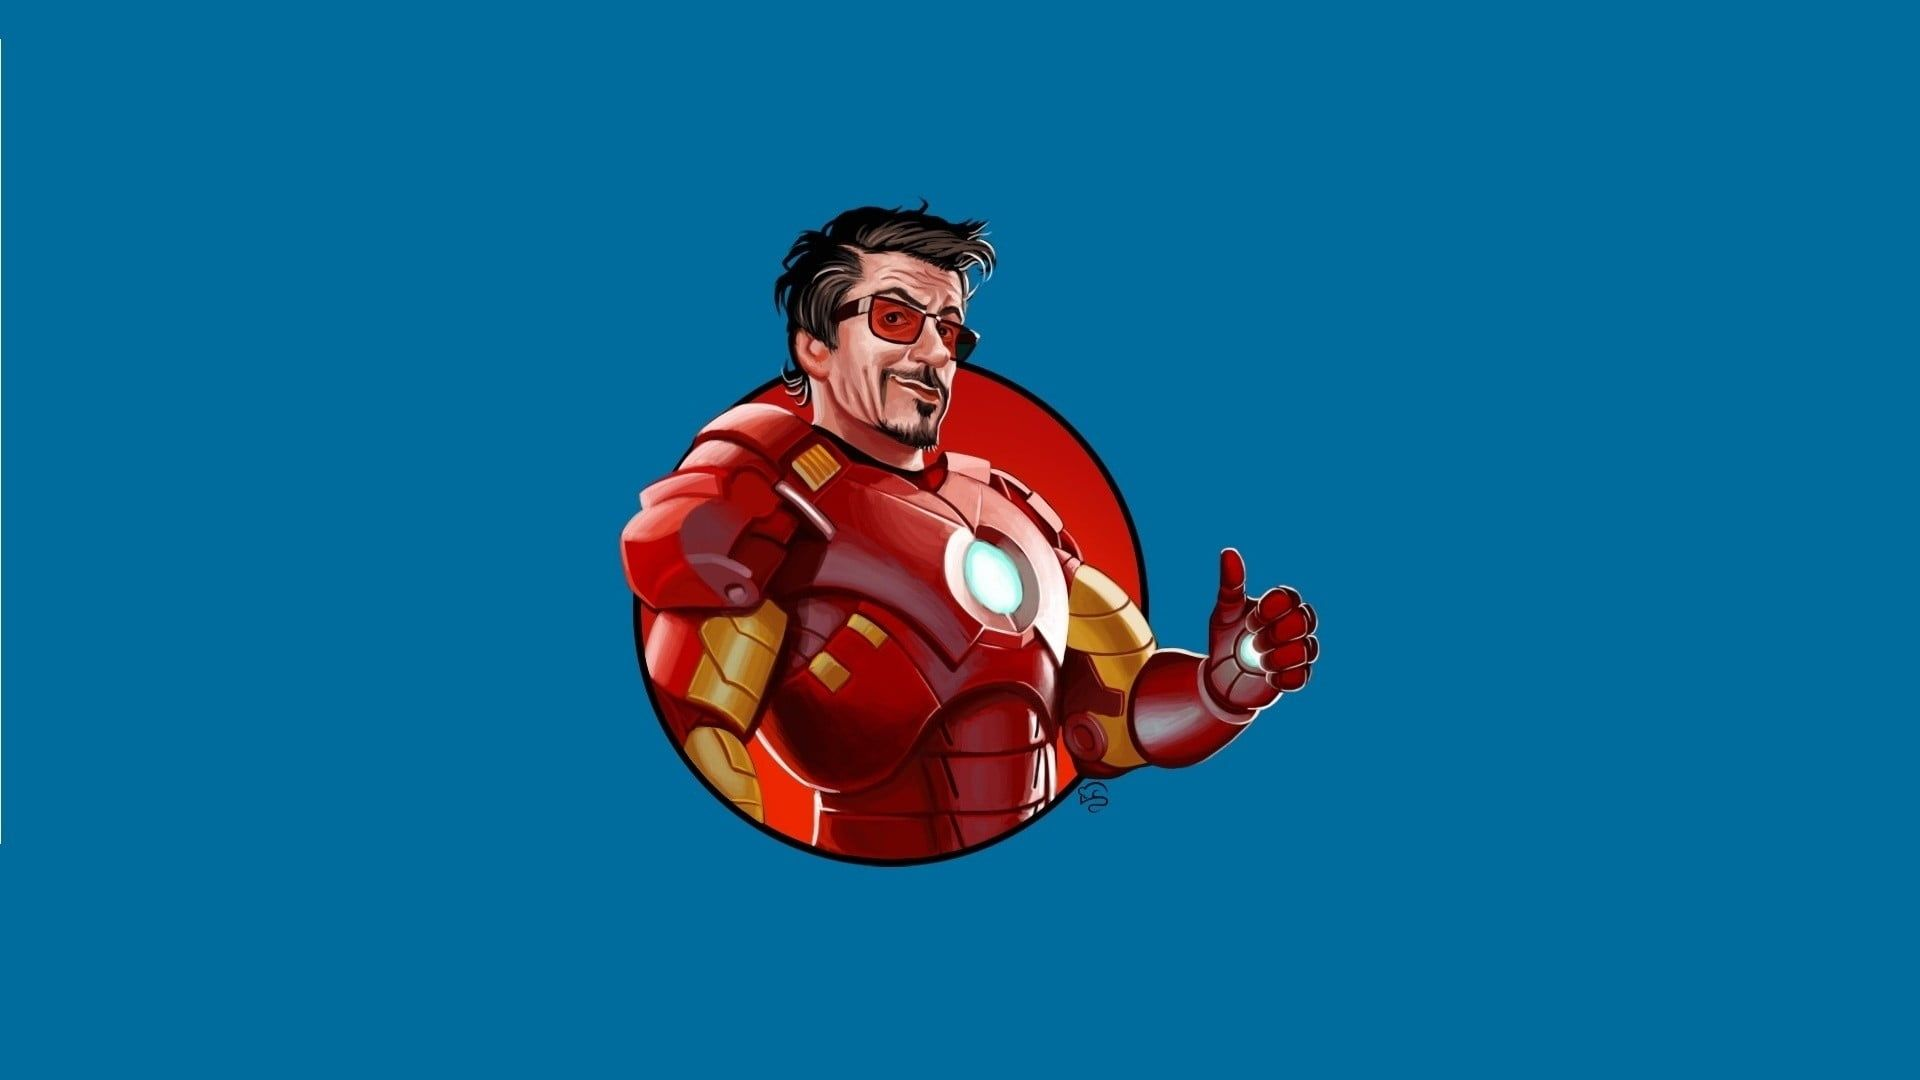 Iron Man Cartoon Wallpaper